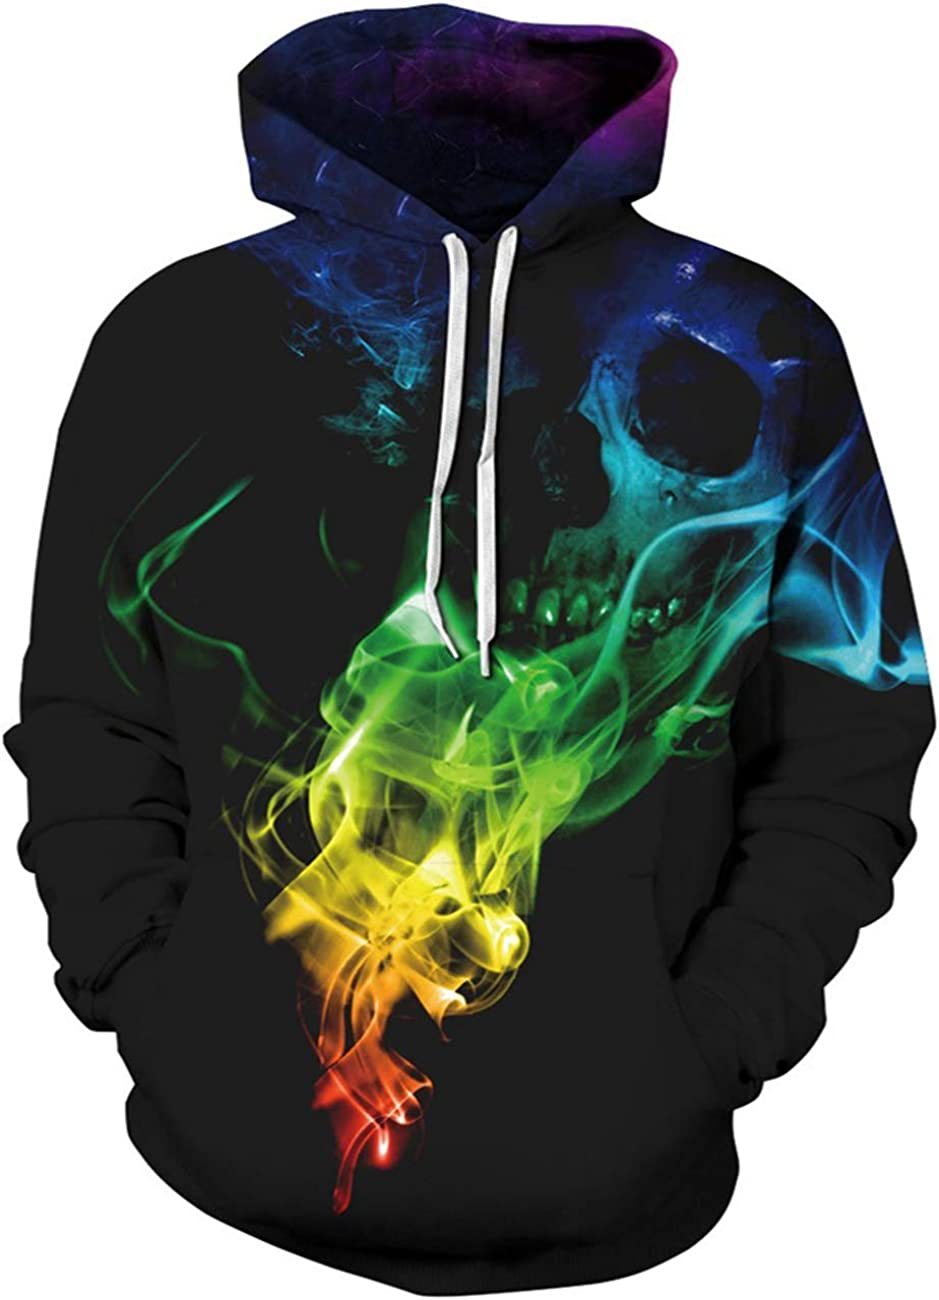 ALISISTER Unisex Award-winning store 3D Hoodie Pullover Spring new work Fleece Hooded Sweatshirt wit